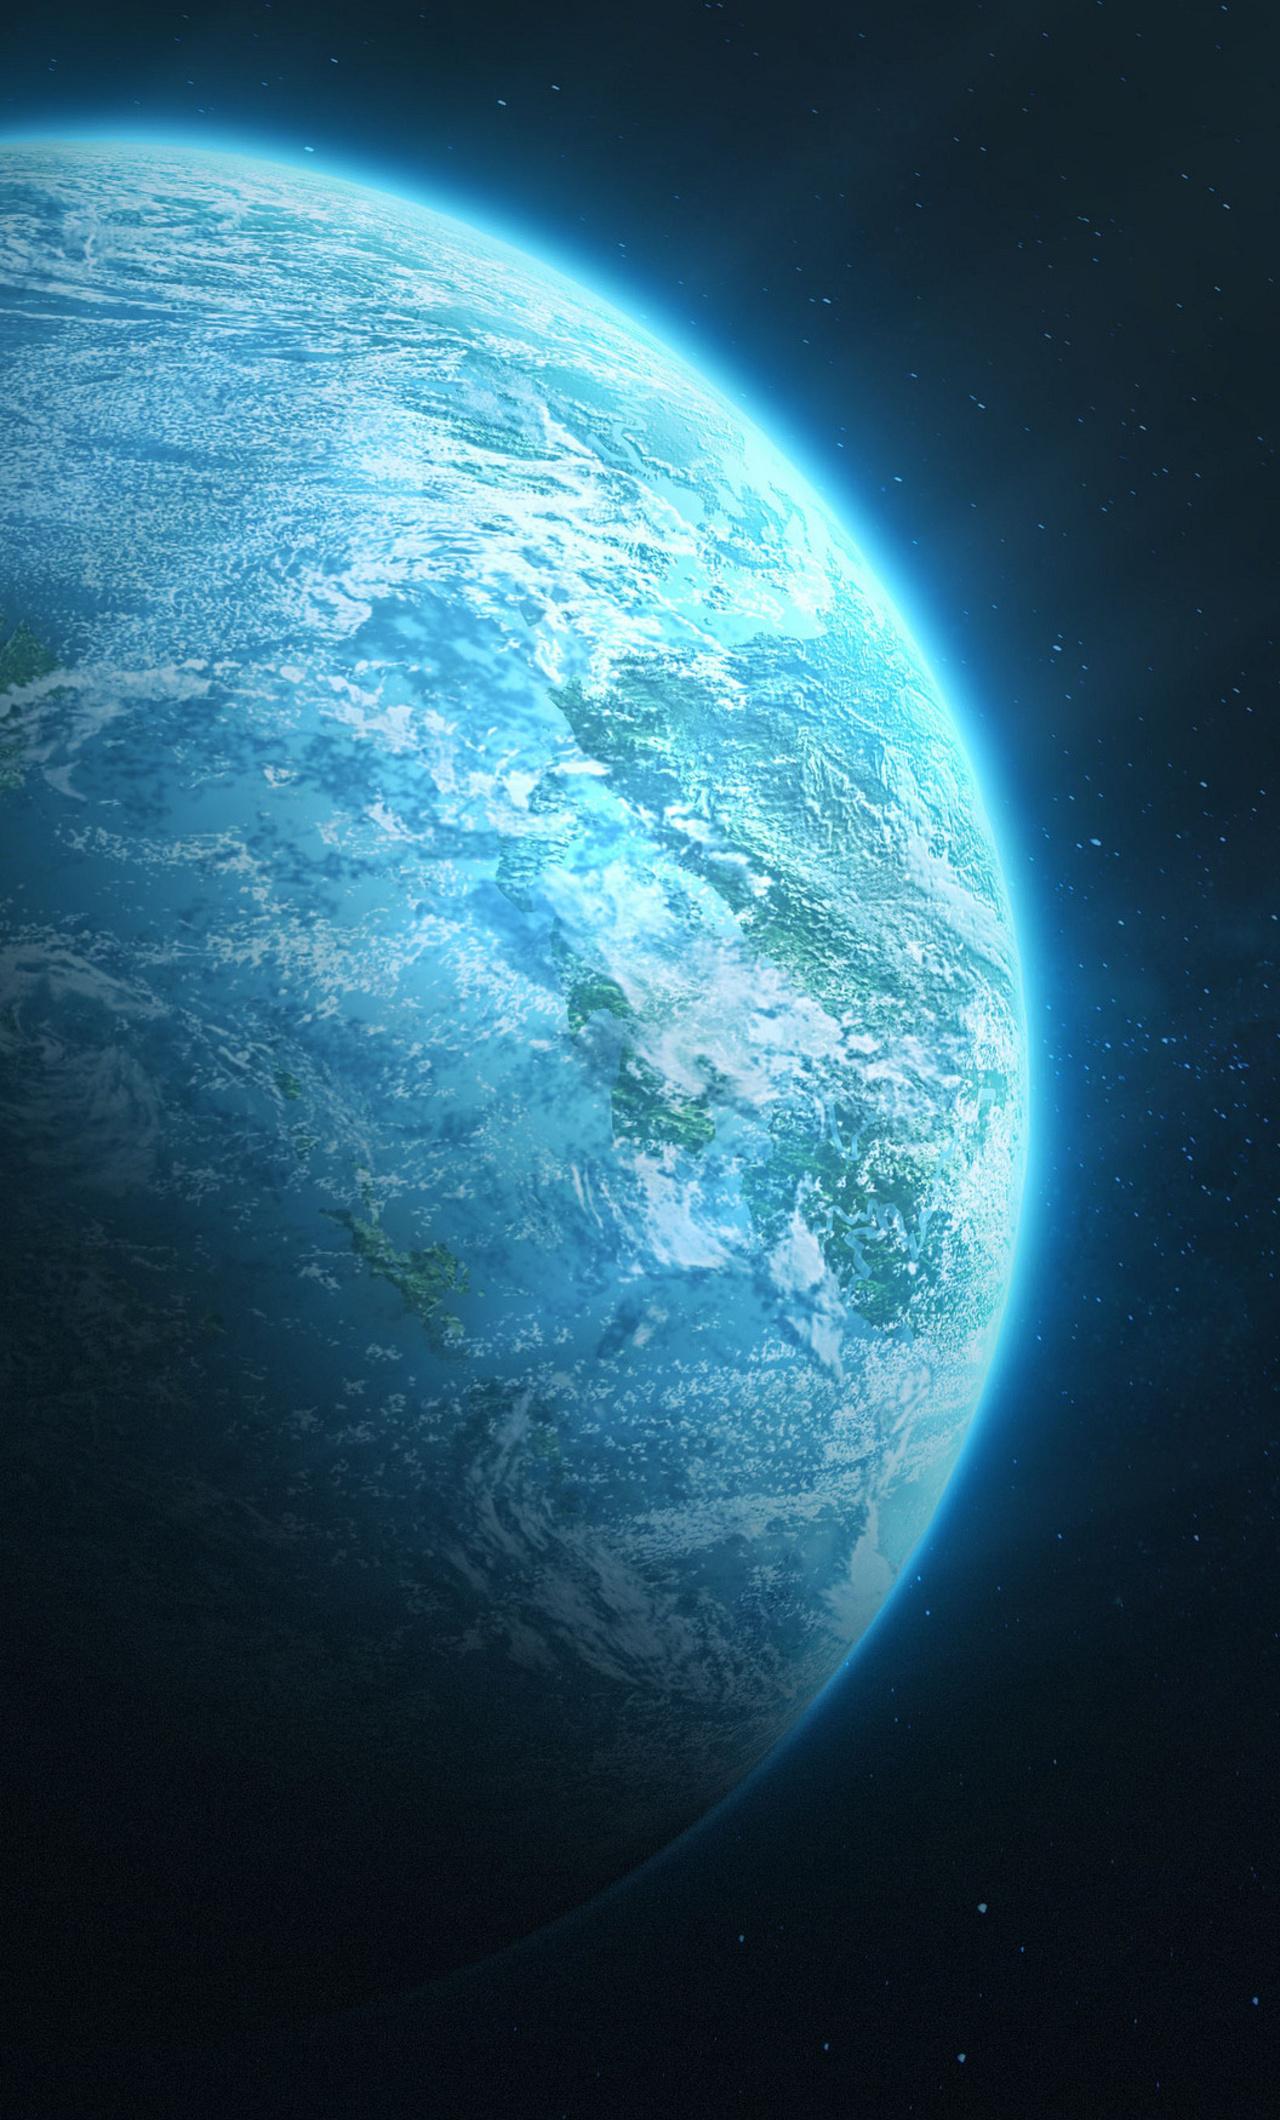 blue-planet-space-view-4k-kh.jpg